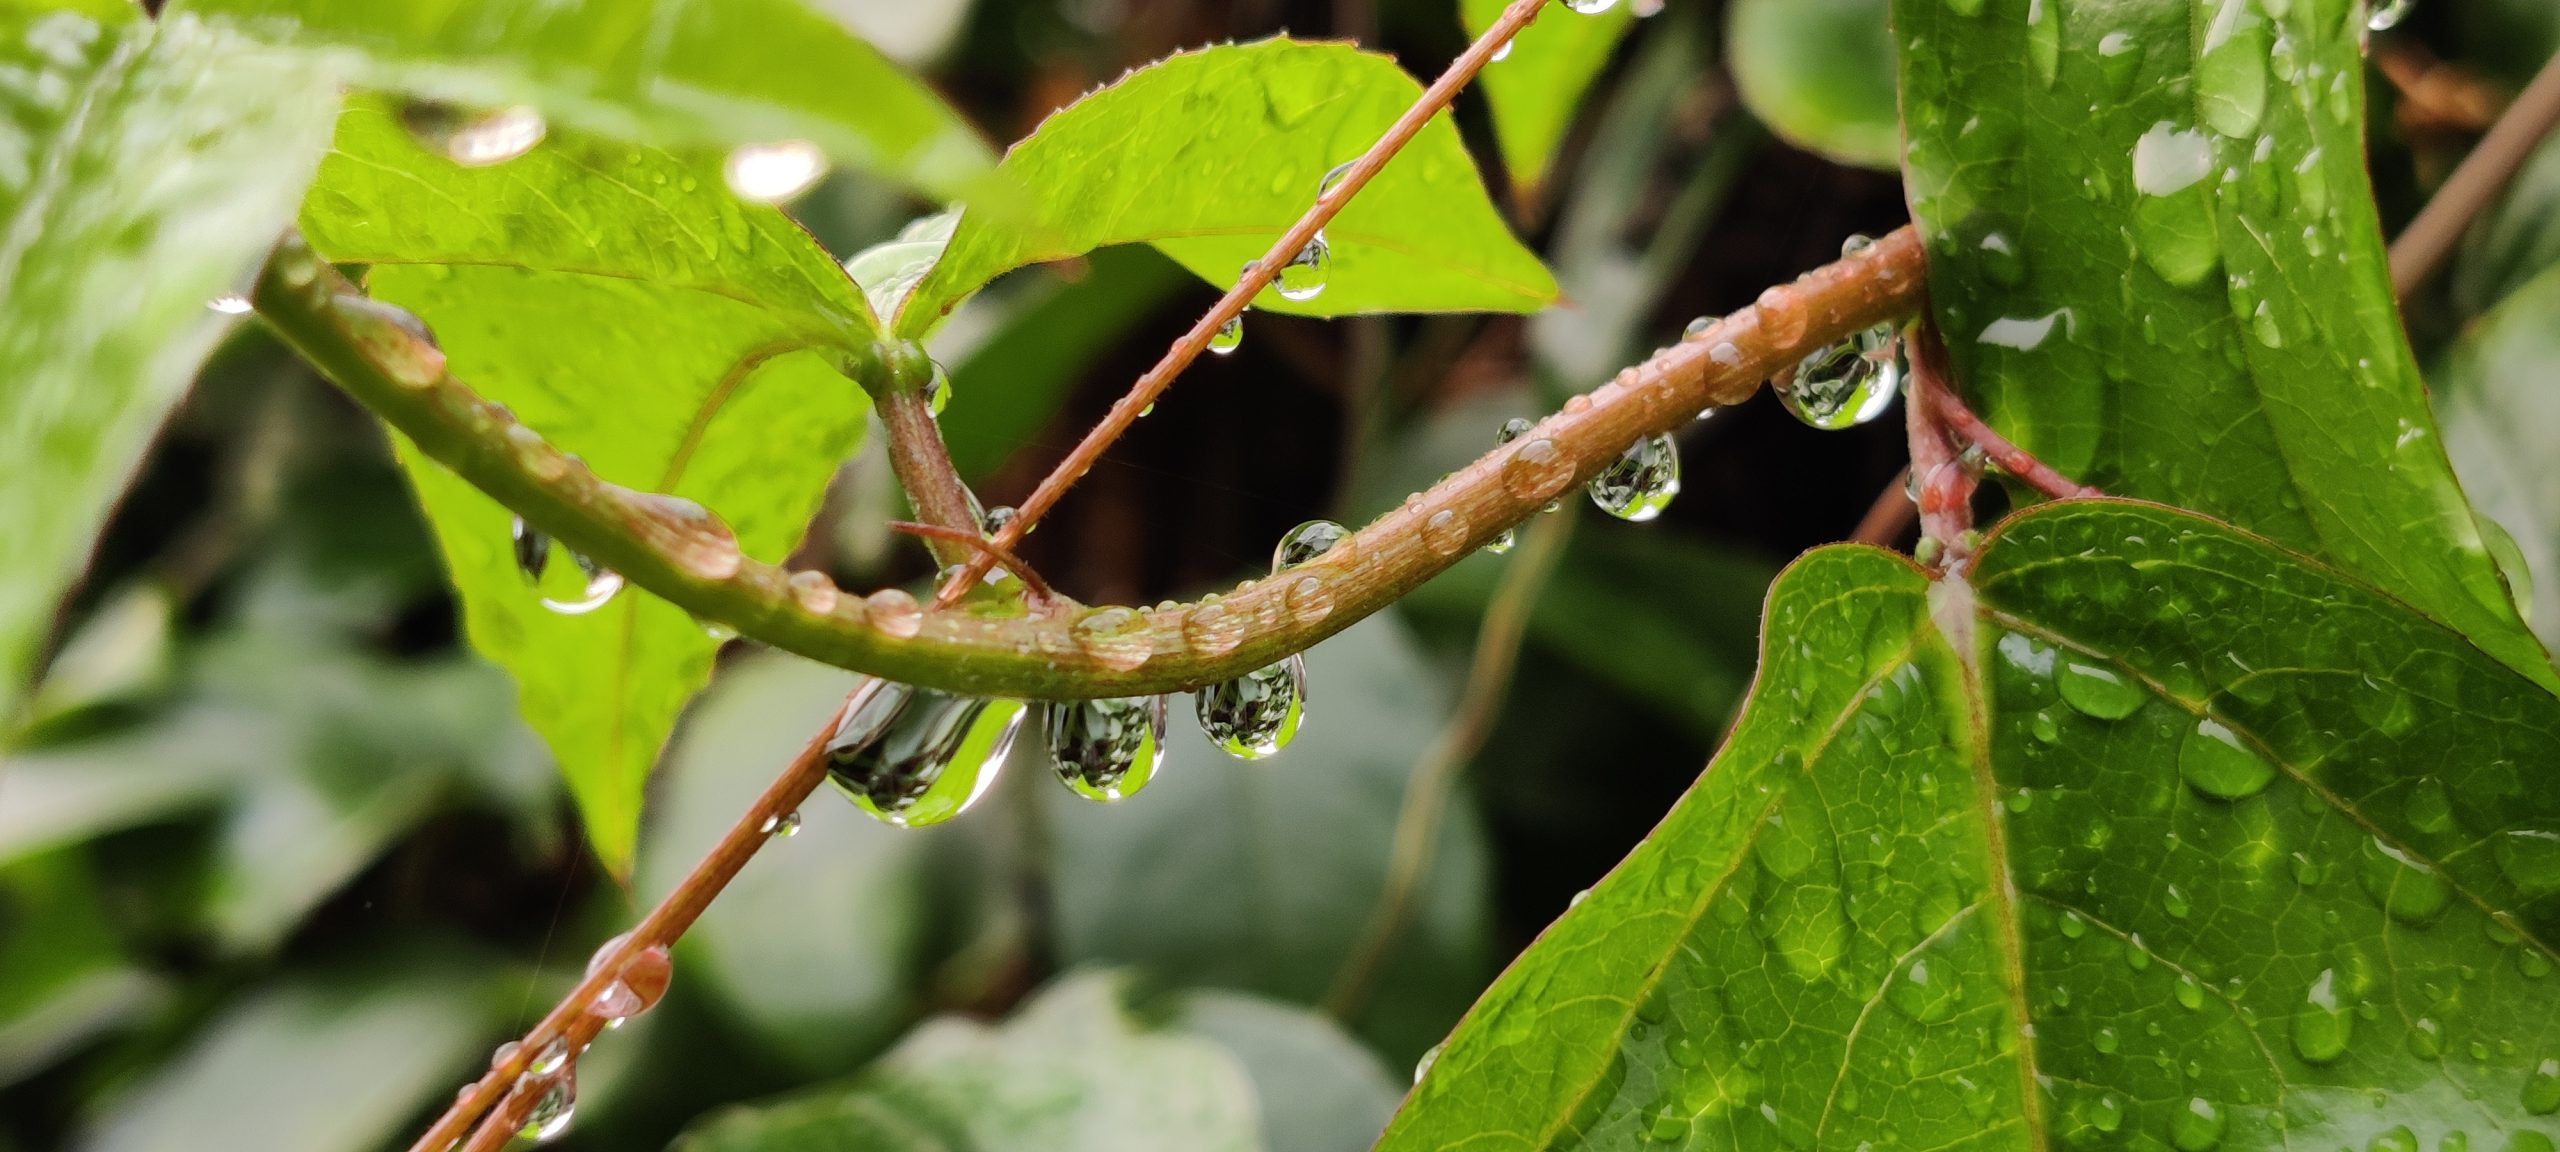 Drops on plant stem